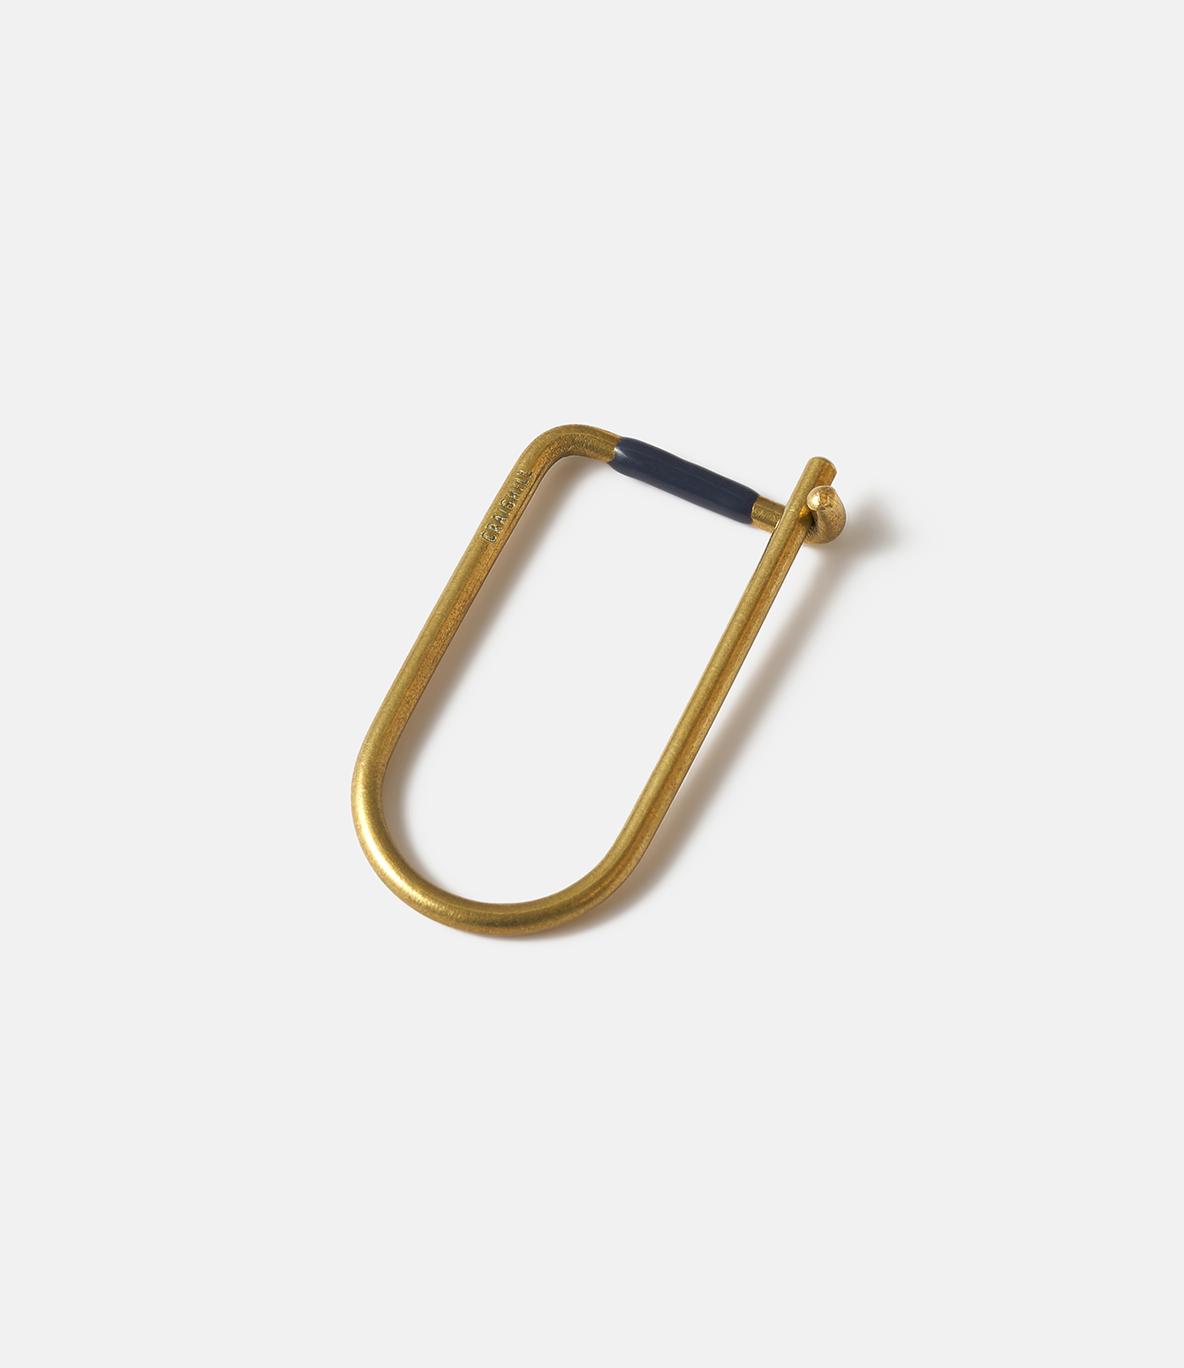 Craighill Wilson Brass Blue — ключница из латуни: синяя эмаль